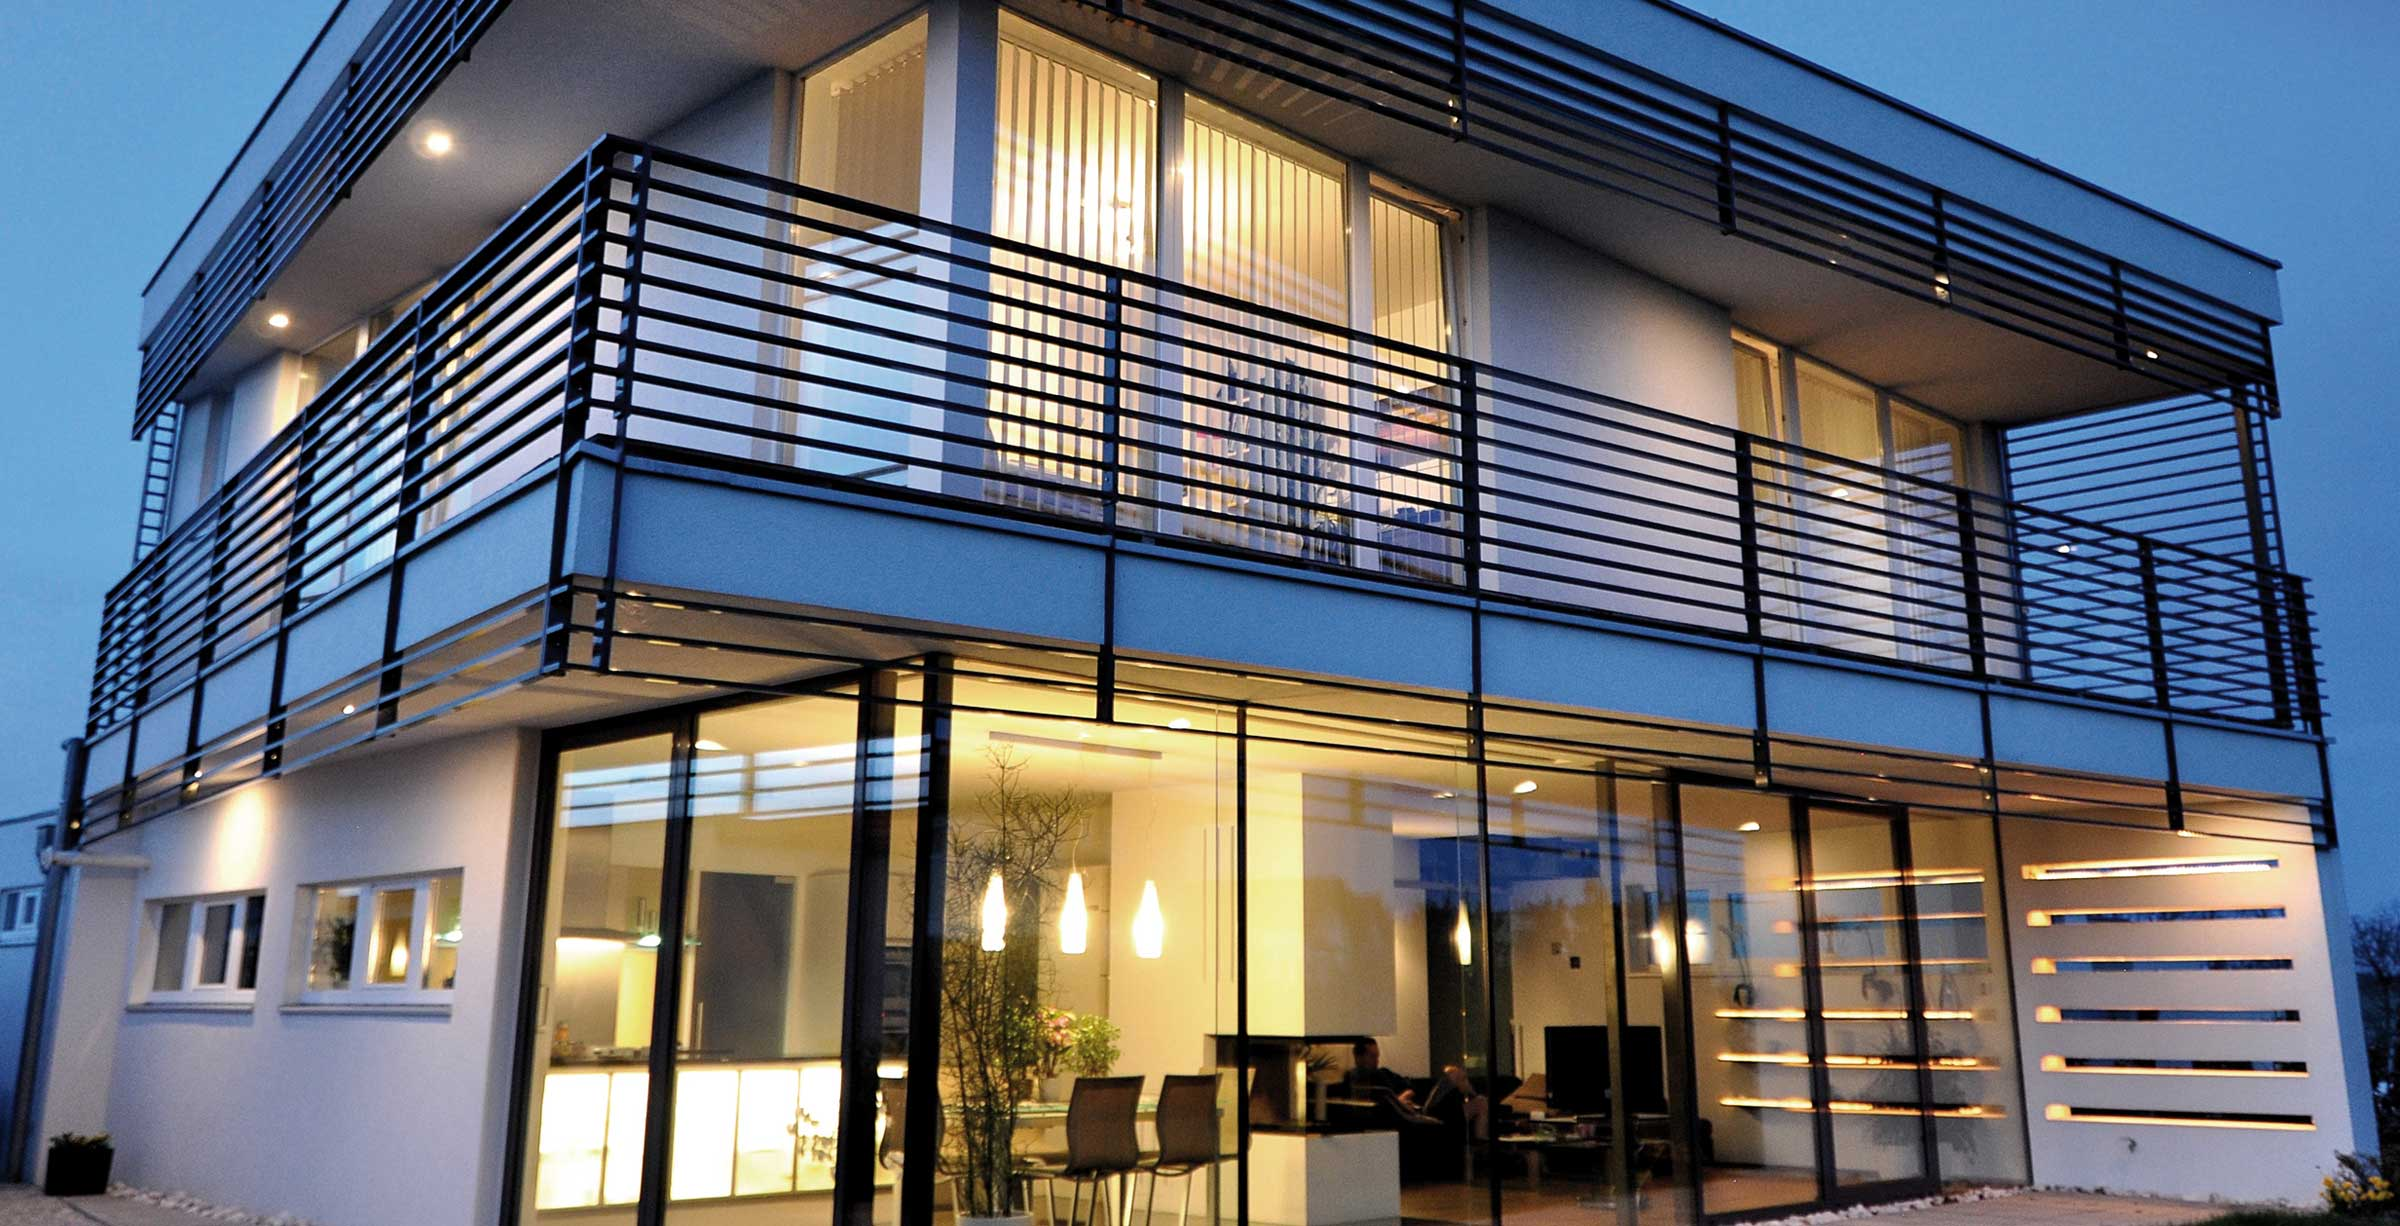 Building Designer Homes On Vienna S Steepest Slopes